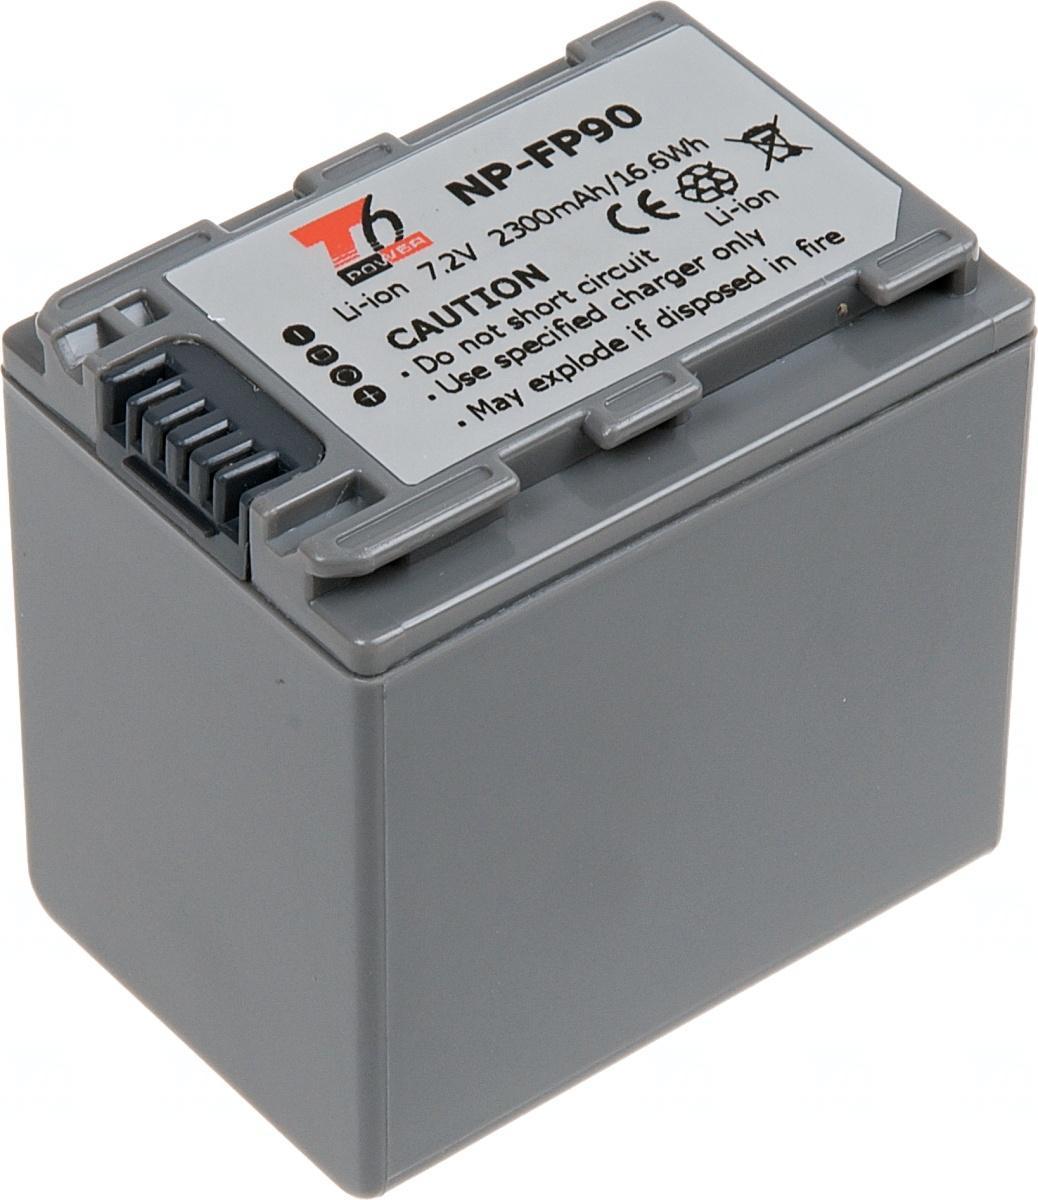 T6 POWER Baterie T6 power Sony NP-FP90, 2300mAh, šedá VCSO0040